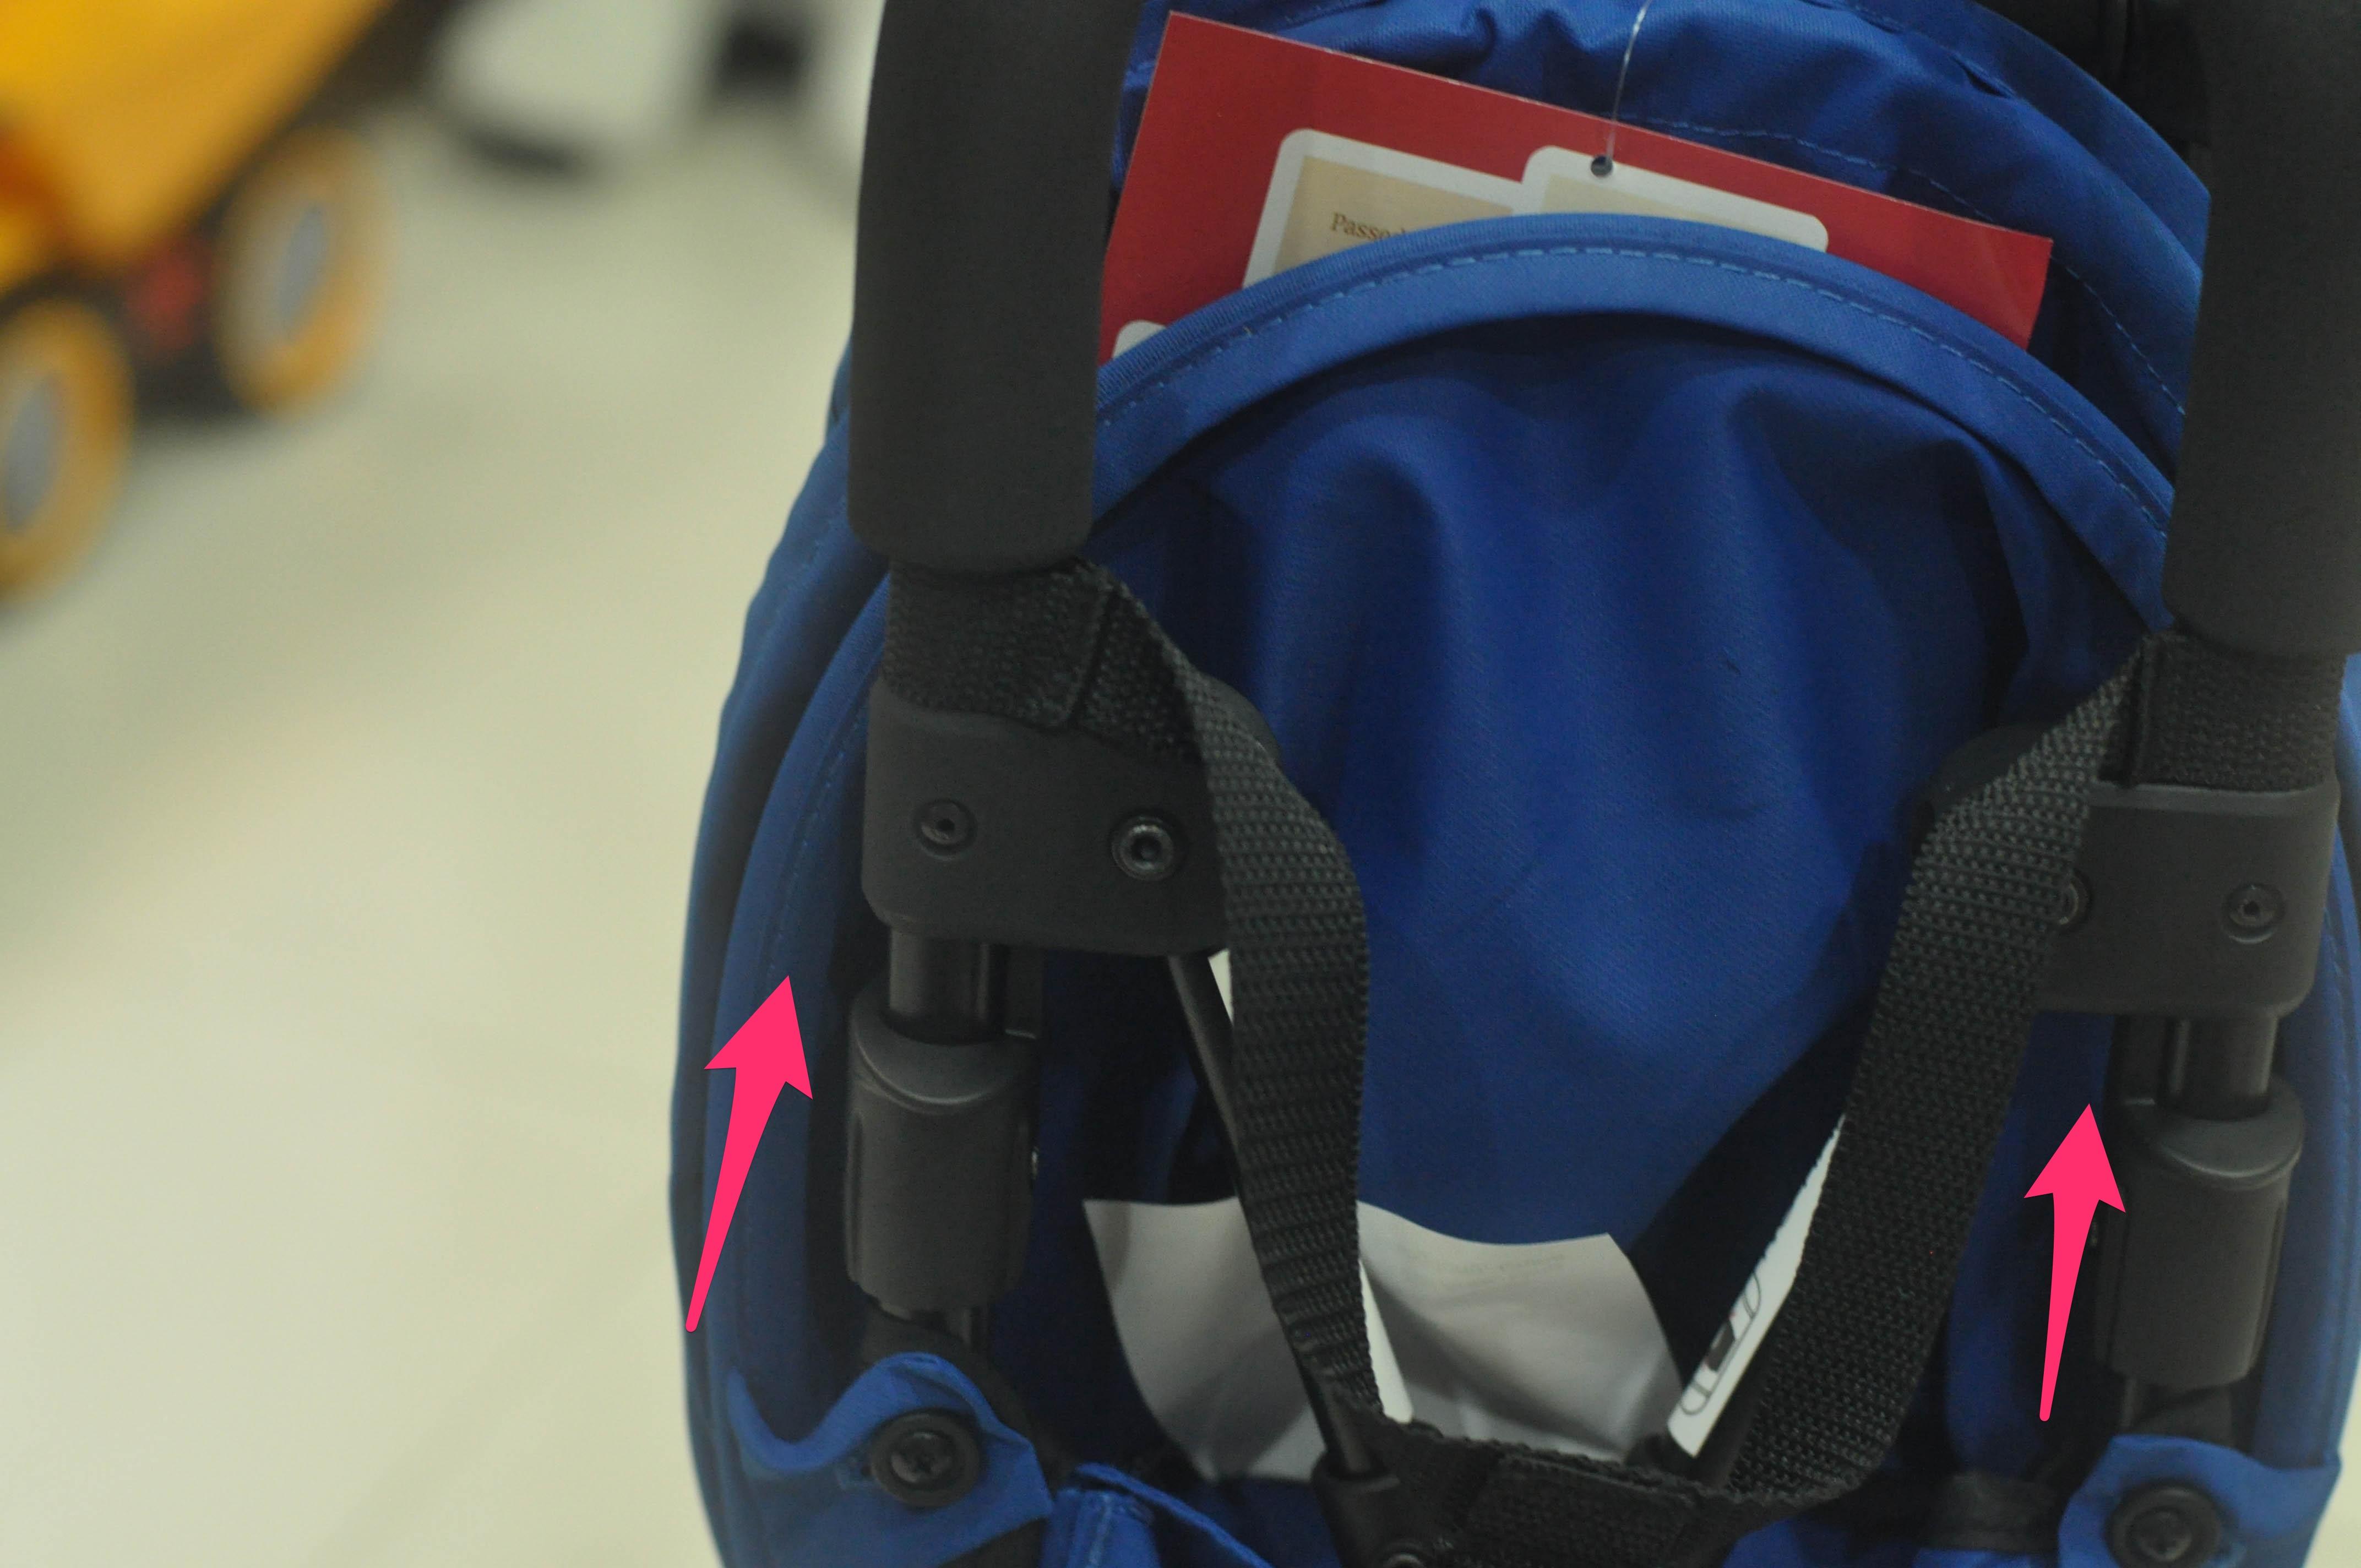 akeeva alvis pocket stroller philippines how to fold